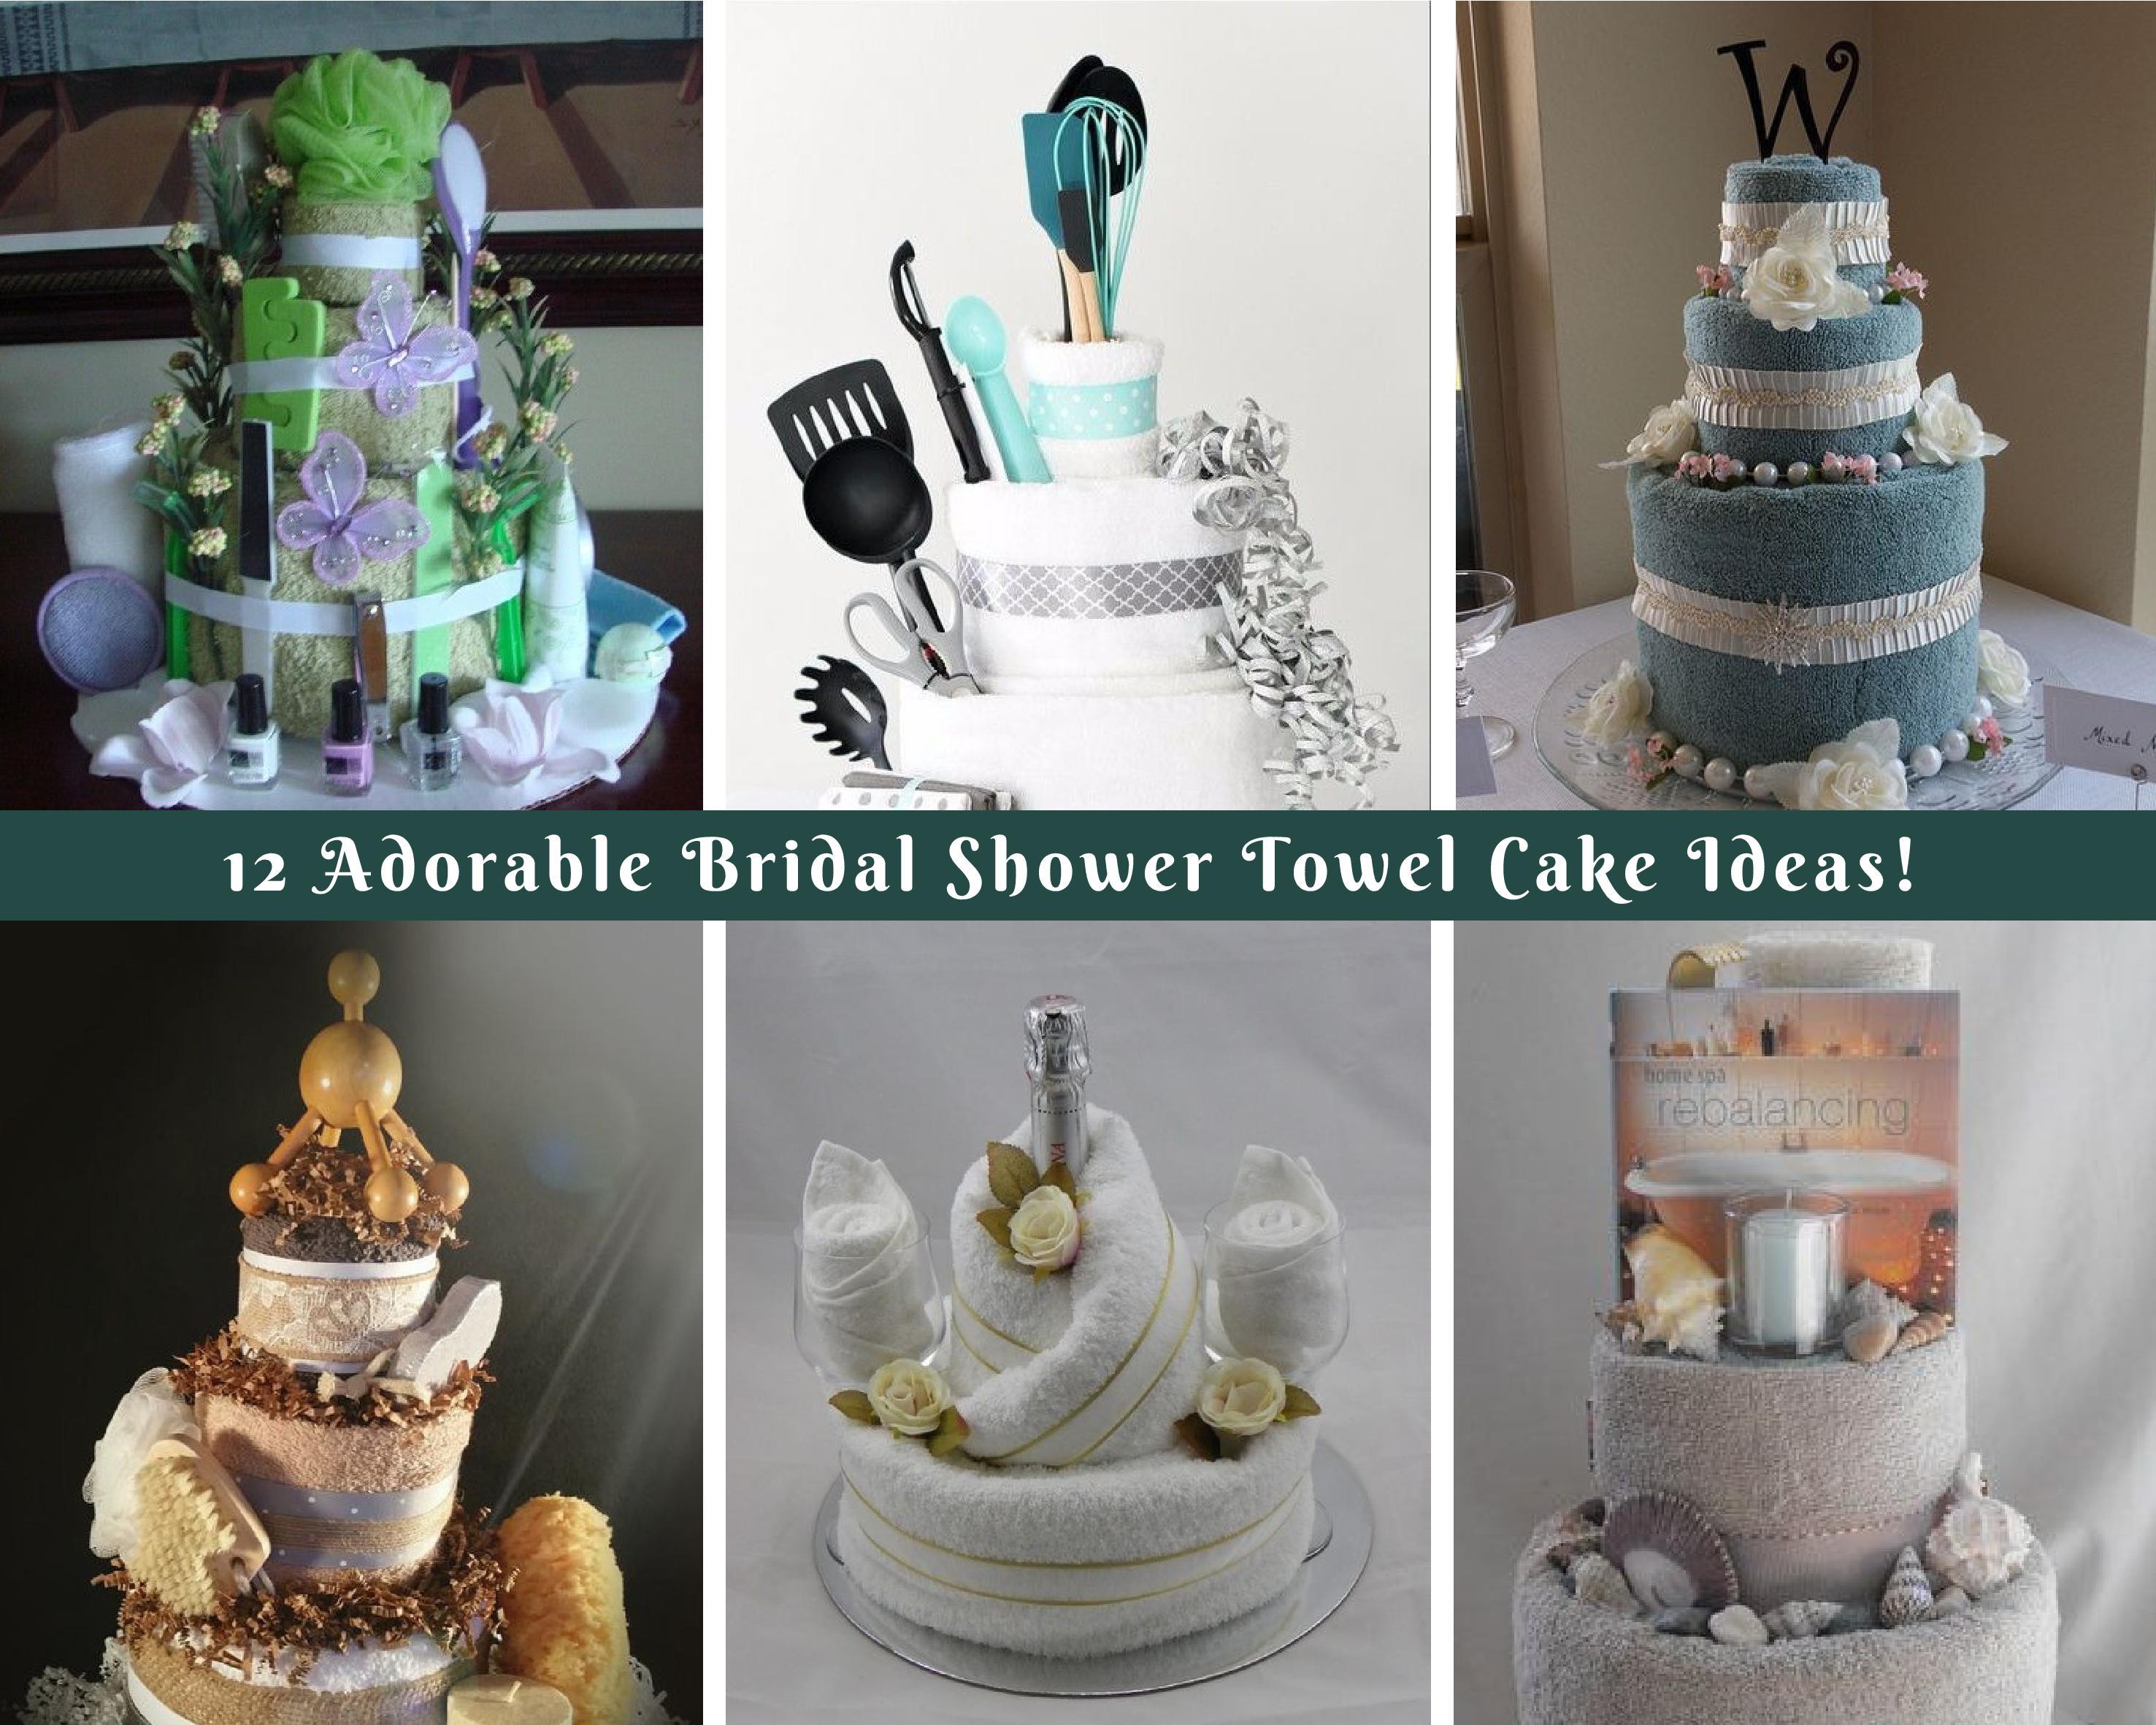 12 Adorable Bridal Shower Towel Cake Ideas